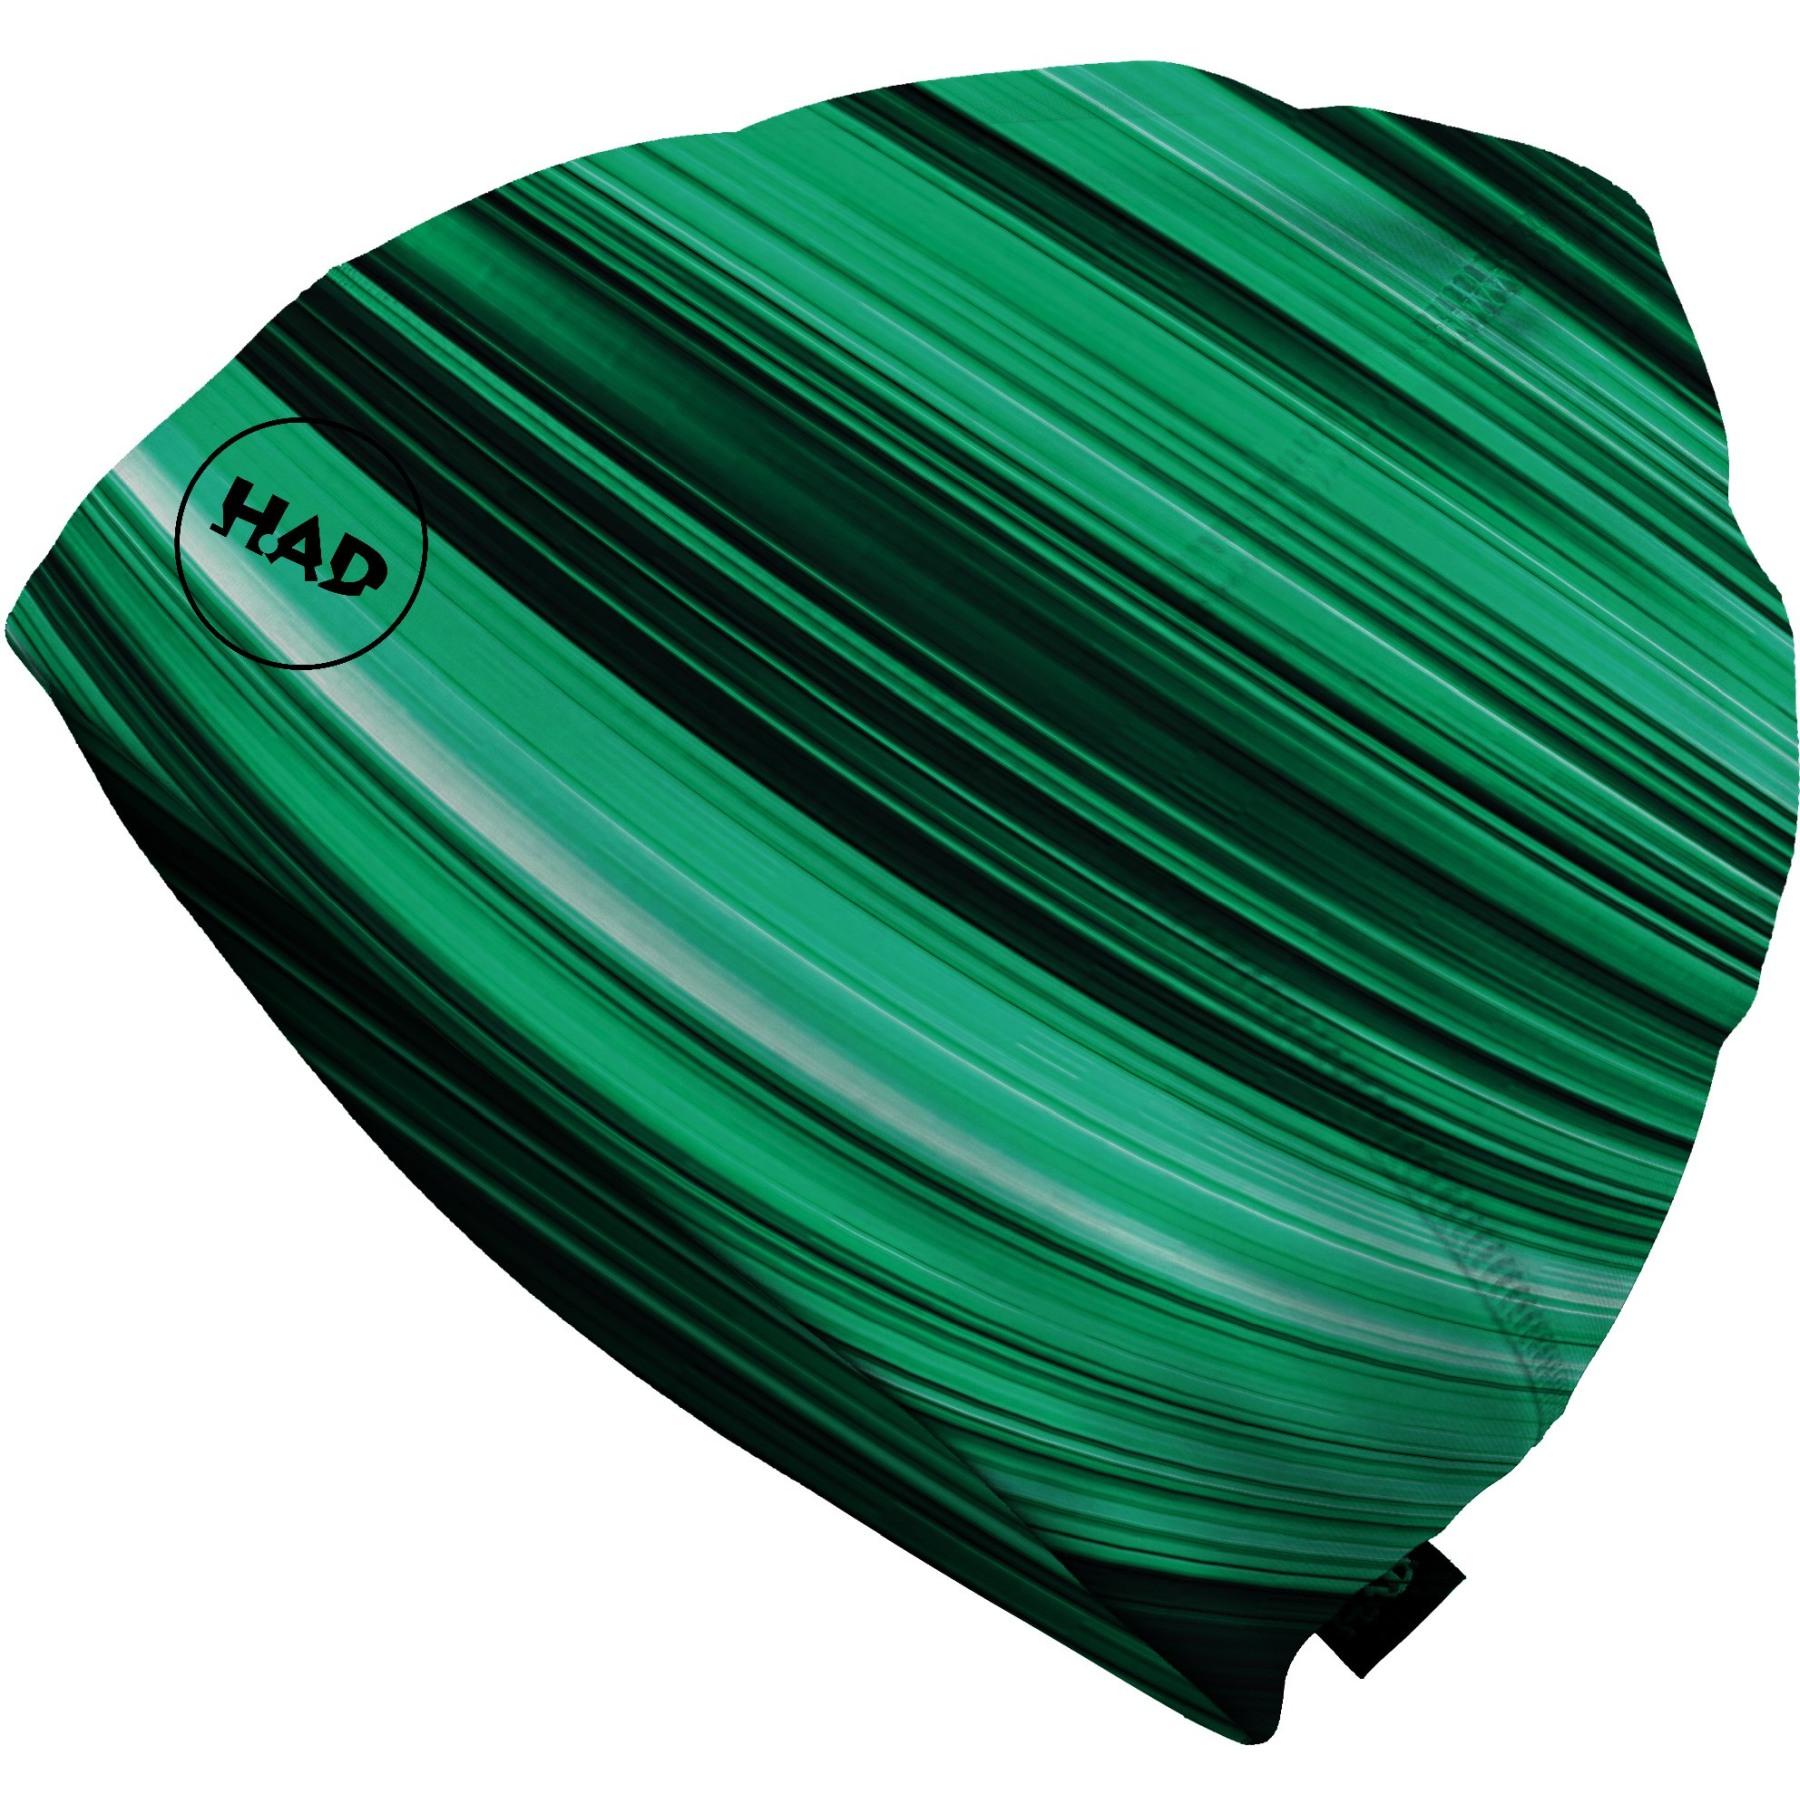 HAD Brushed Eco Beanie - Furious Green